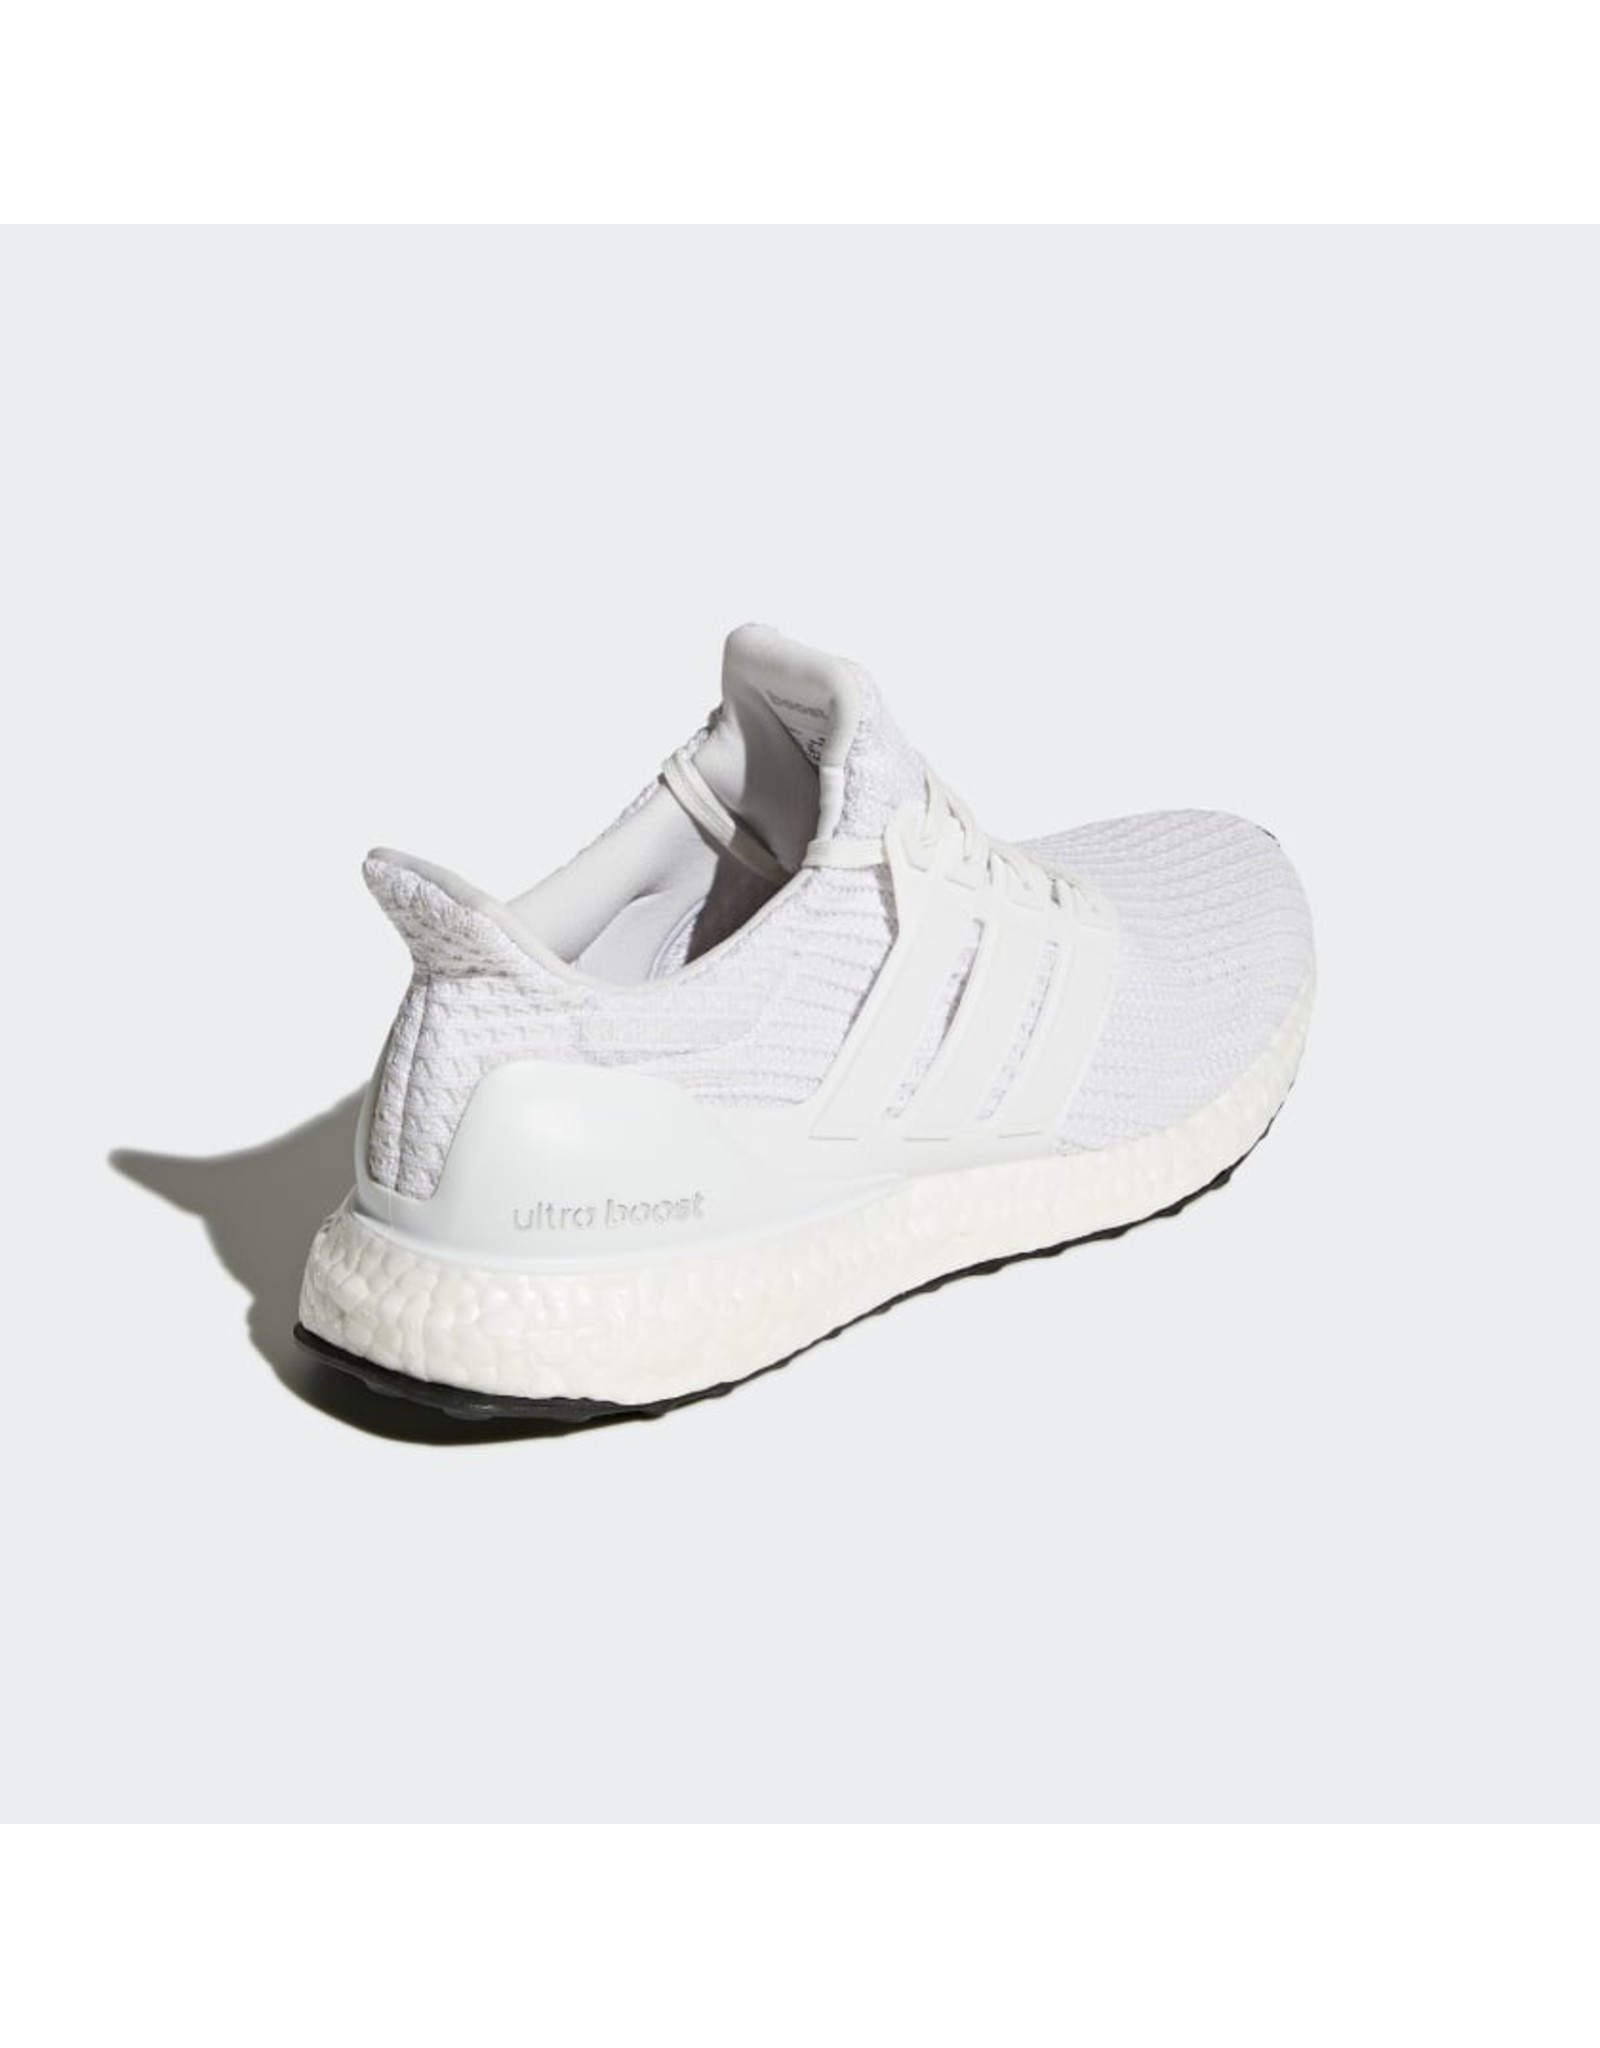 ADIDAS Adidas Ultraboost white